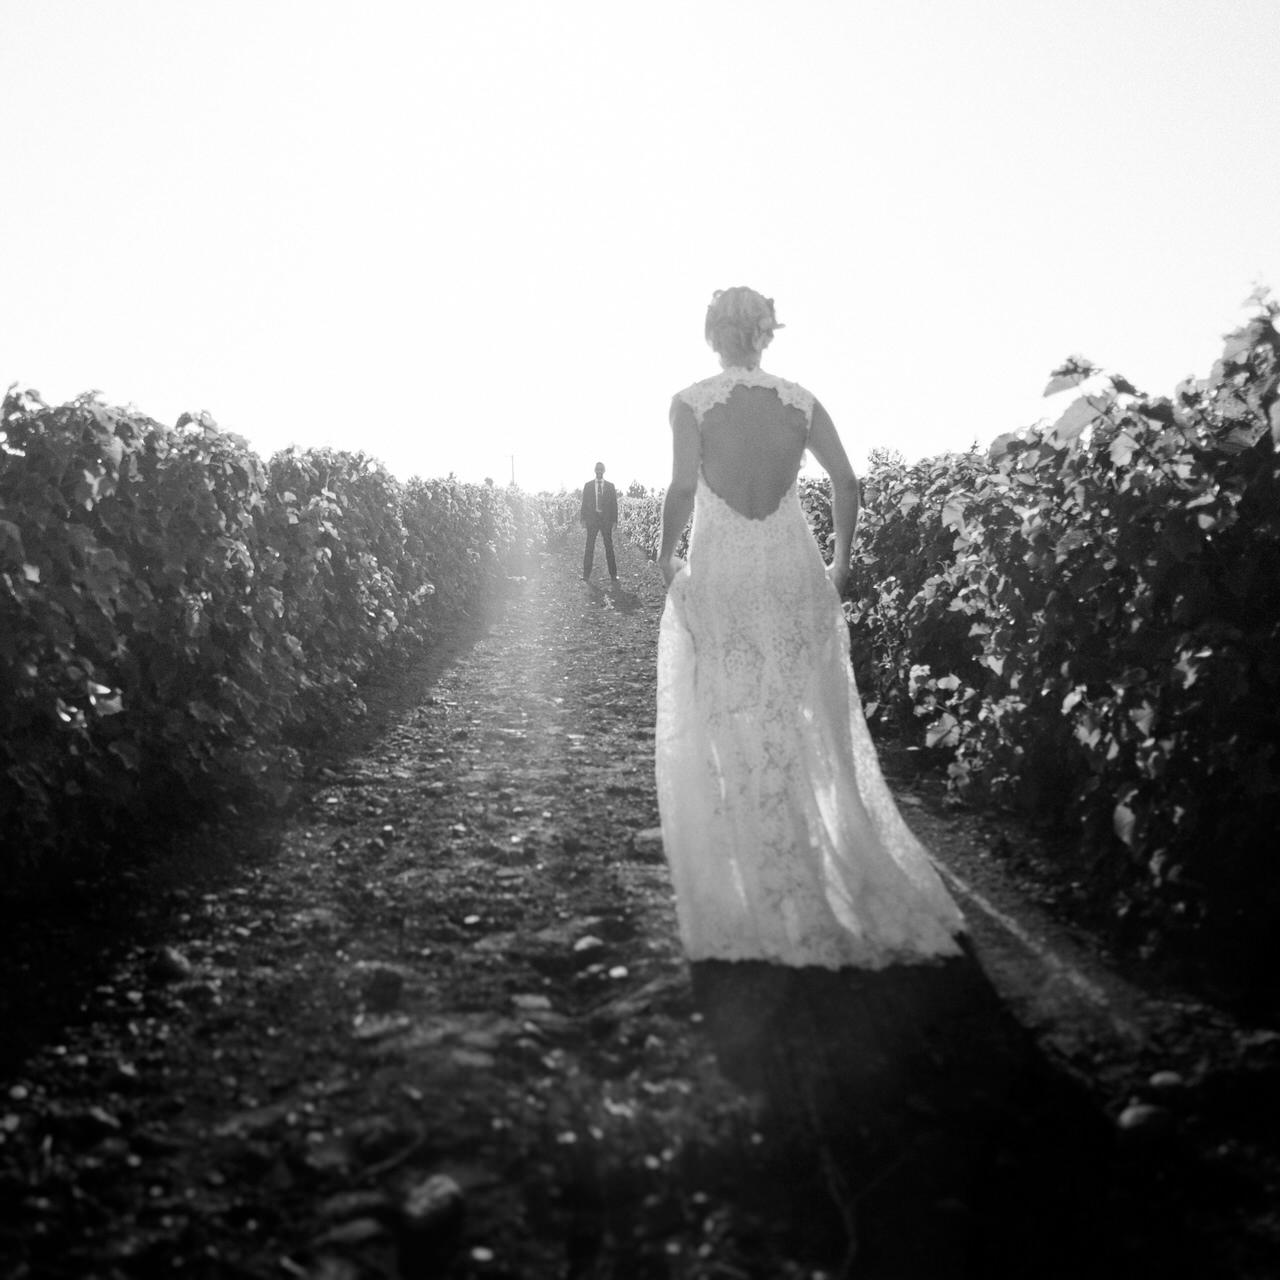 Montreal Vineyard Wedding with Monique l' hillier bridal dress.jpg